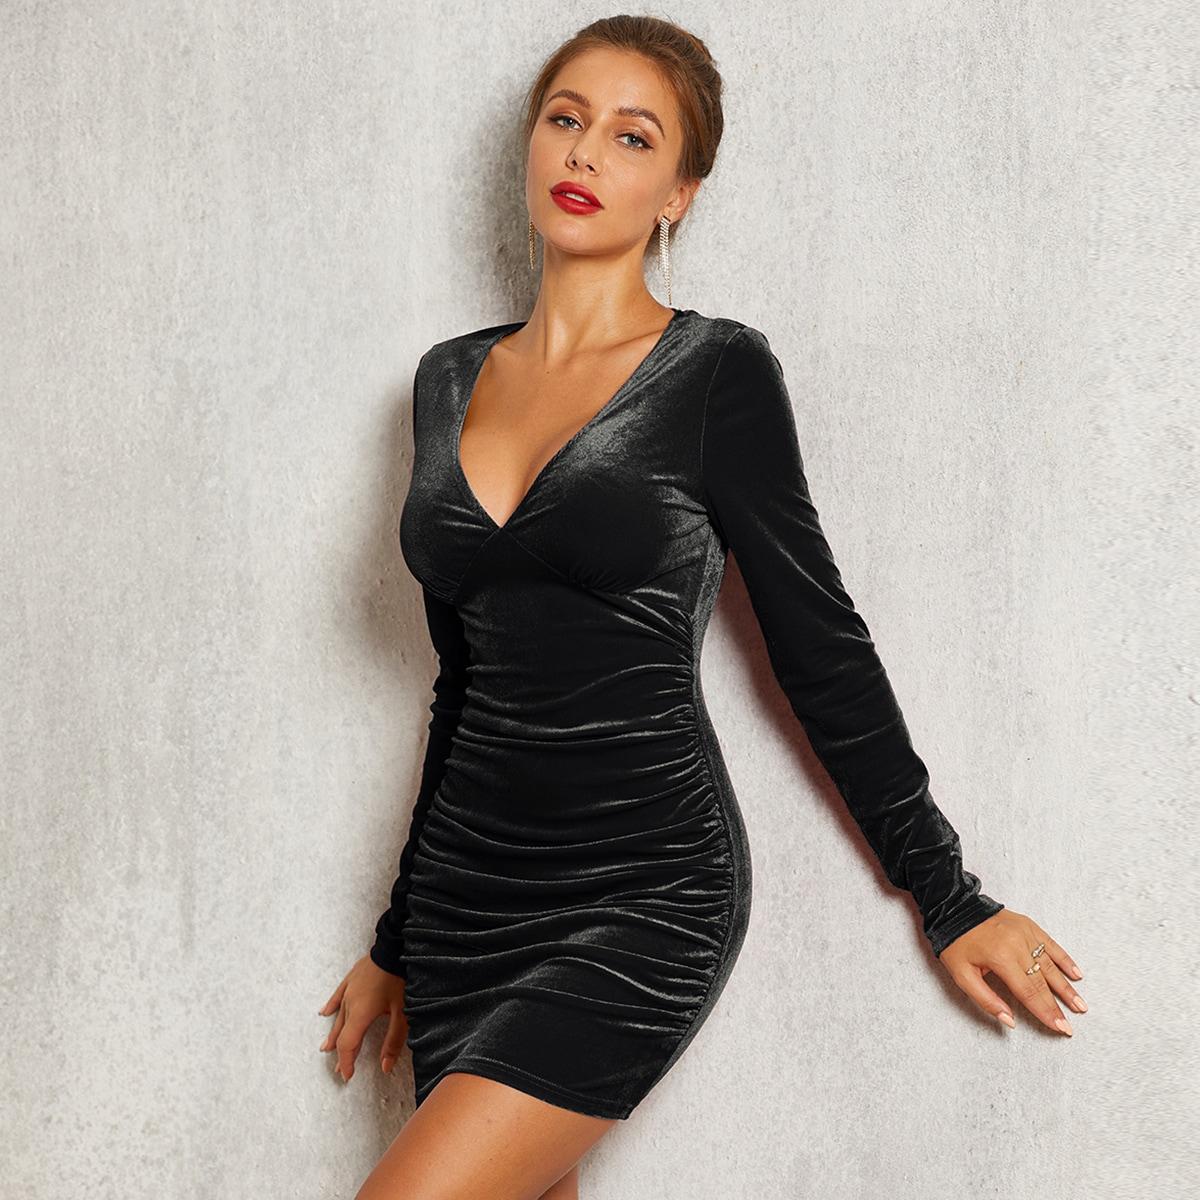 бархатое платье с глубоким вырезом SheIn swdress42191107133